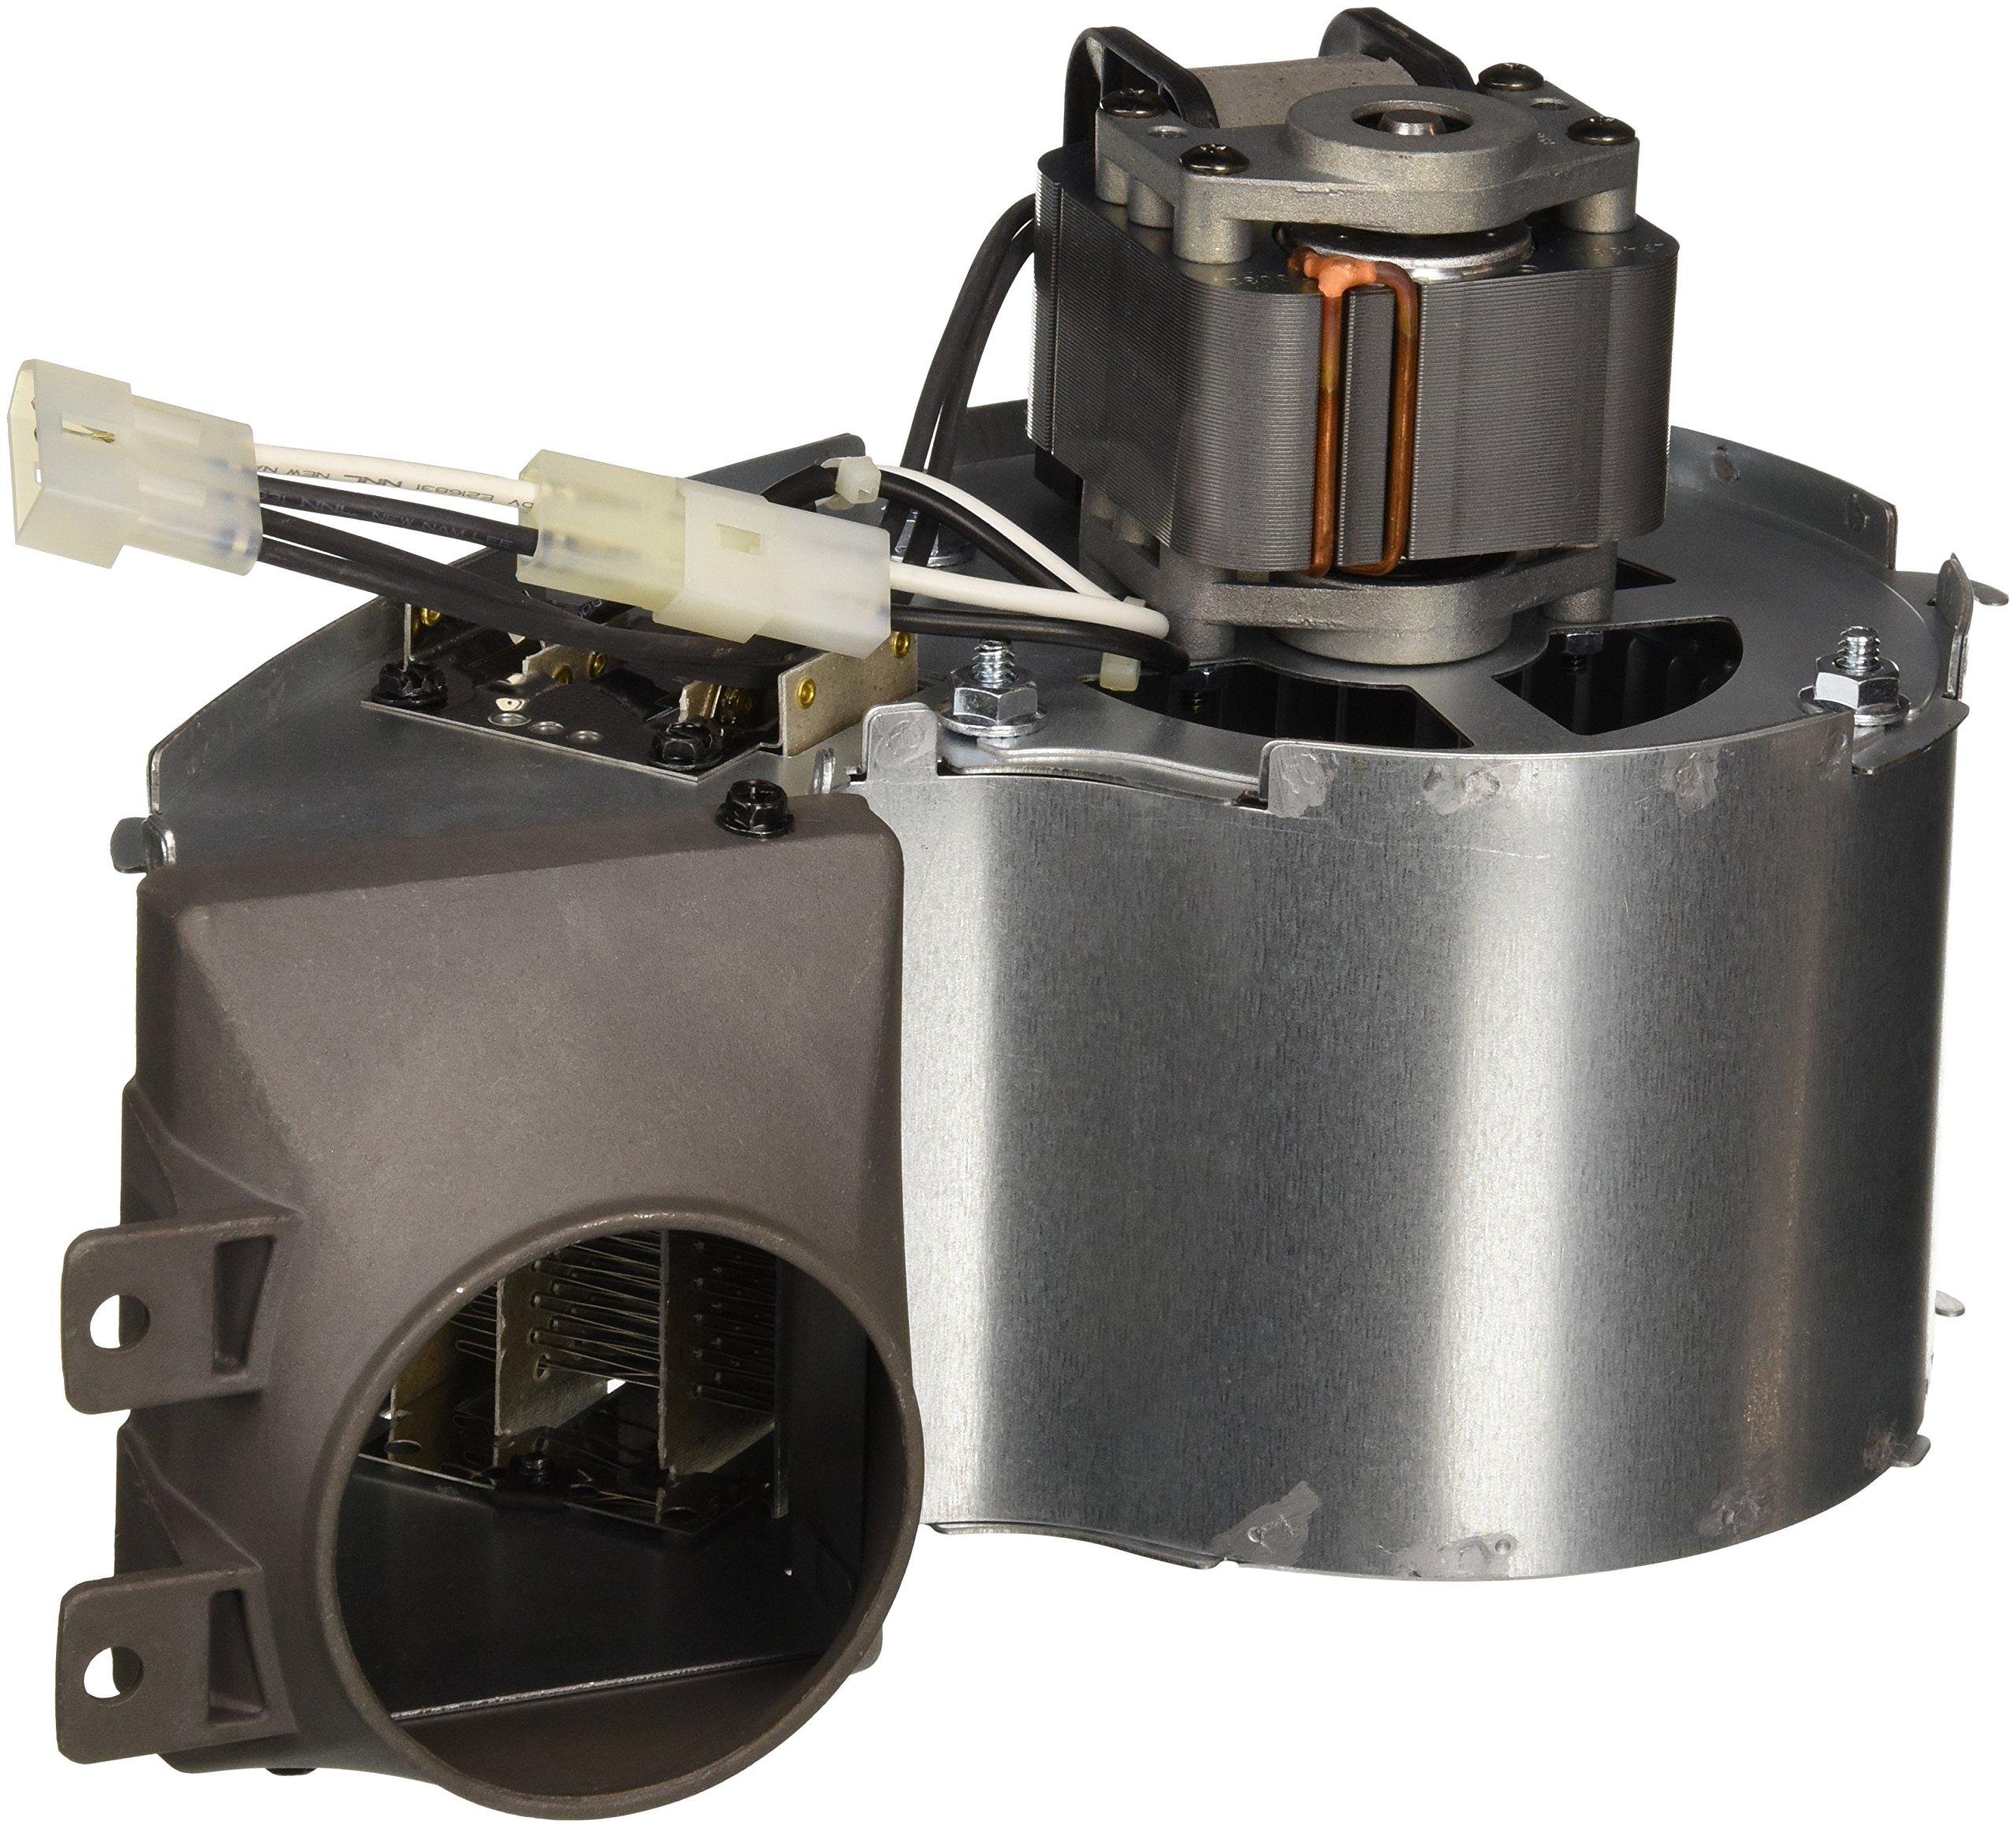 Broan S97020890 replaces S97017768 Bathroom Fan Motor Assembly